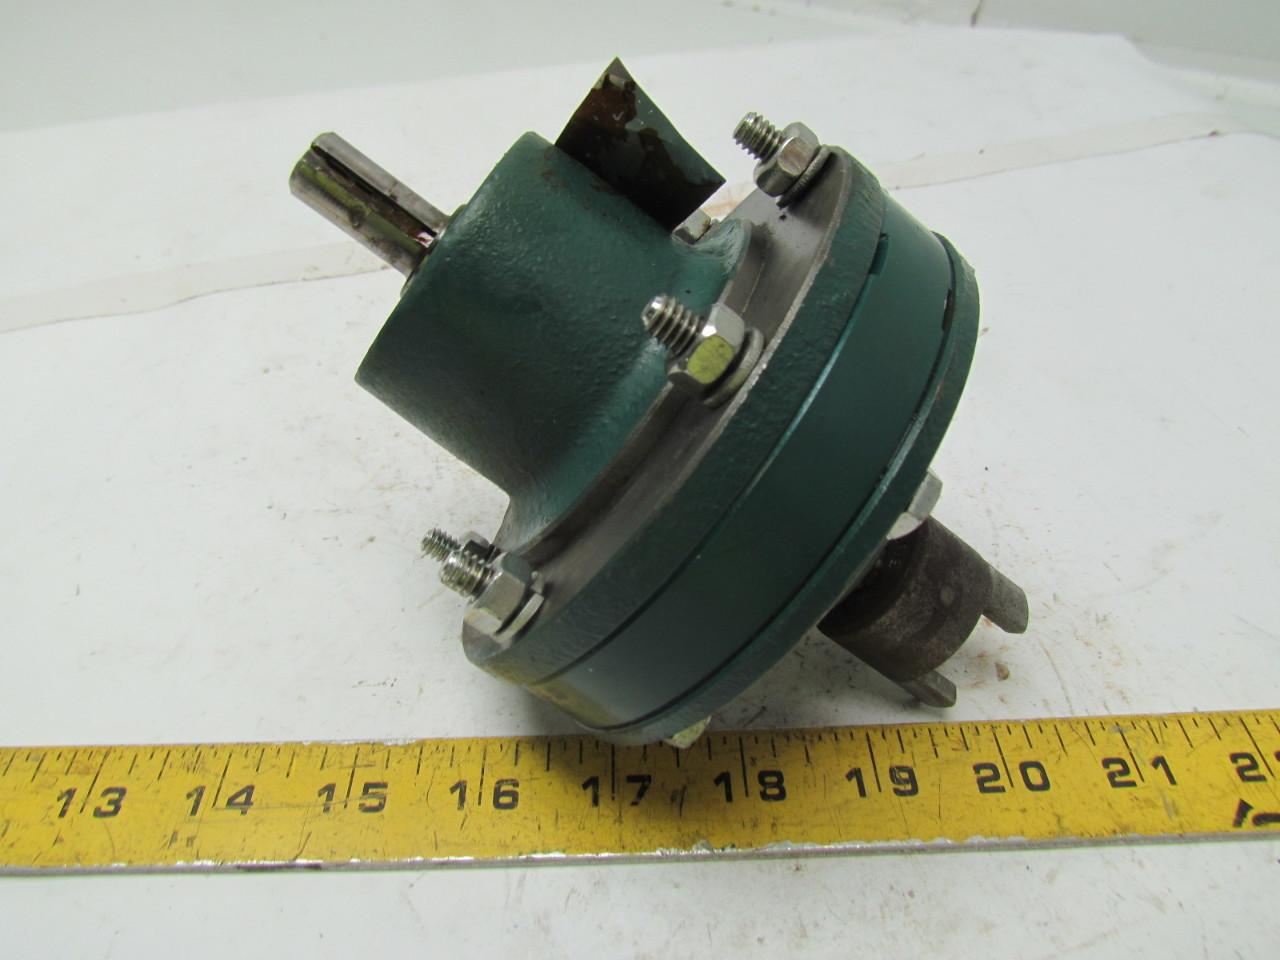 Sumitomo WFS3O75 Gear Reducer 43:1 Ratio .15HP Input 1750RPM 217Inch Lbs Torque